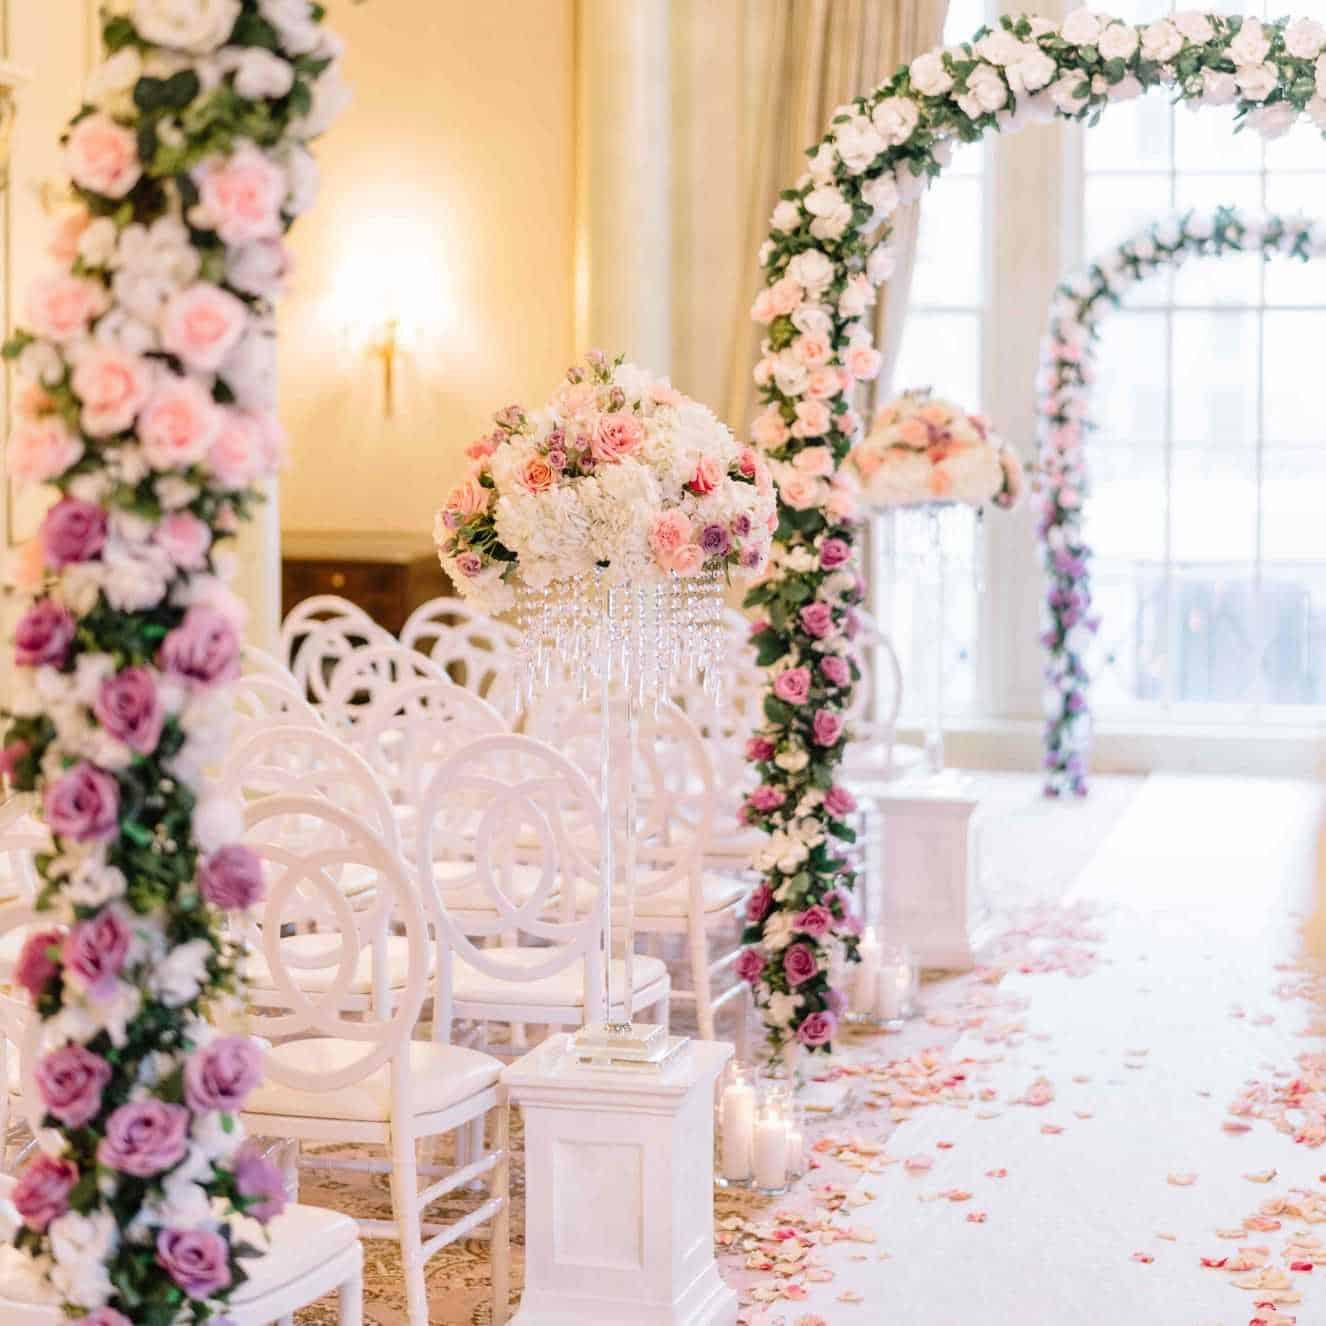 Toronto Wedding Planner - Decor & Stationery